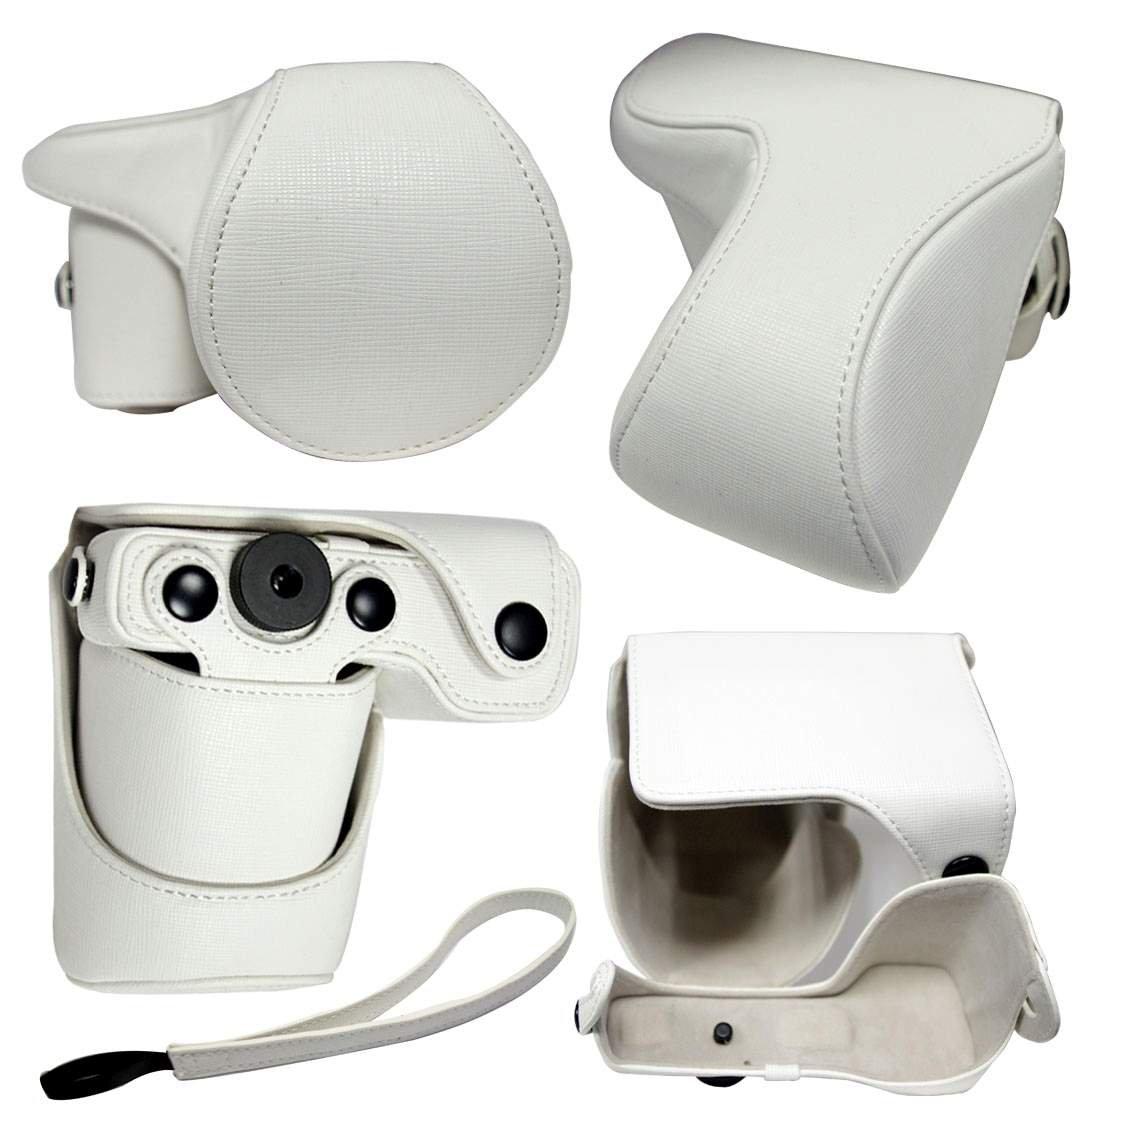 Sony Alpha NEX5 NEX NEX5K/B Digital Camera leather case bag  in black, white, red, or brown